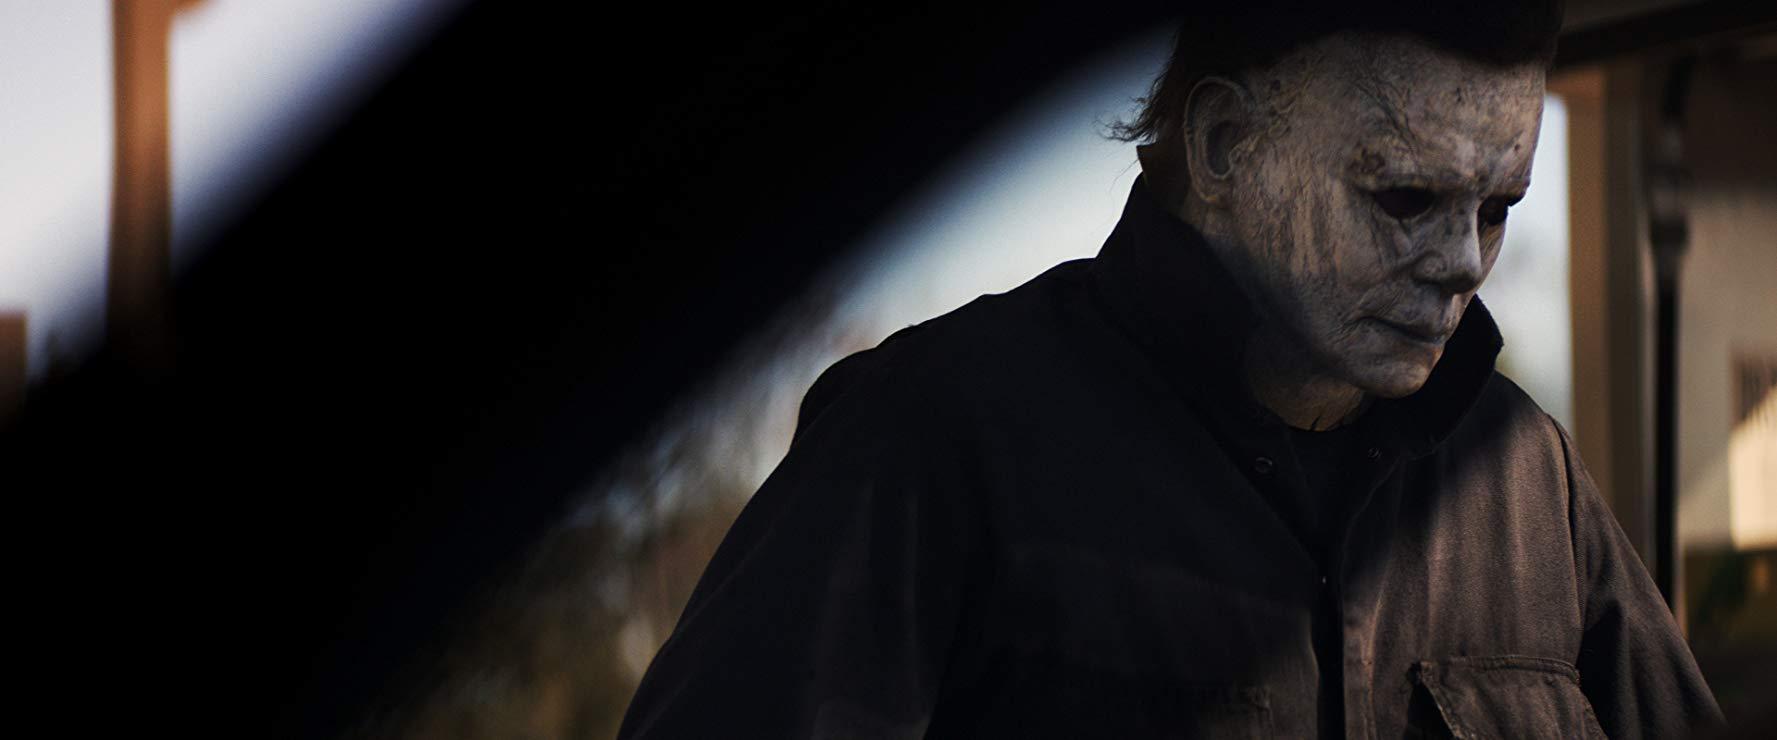 Halloween image film